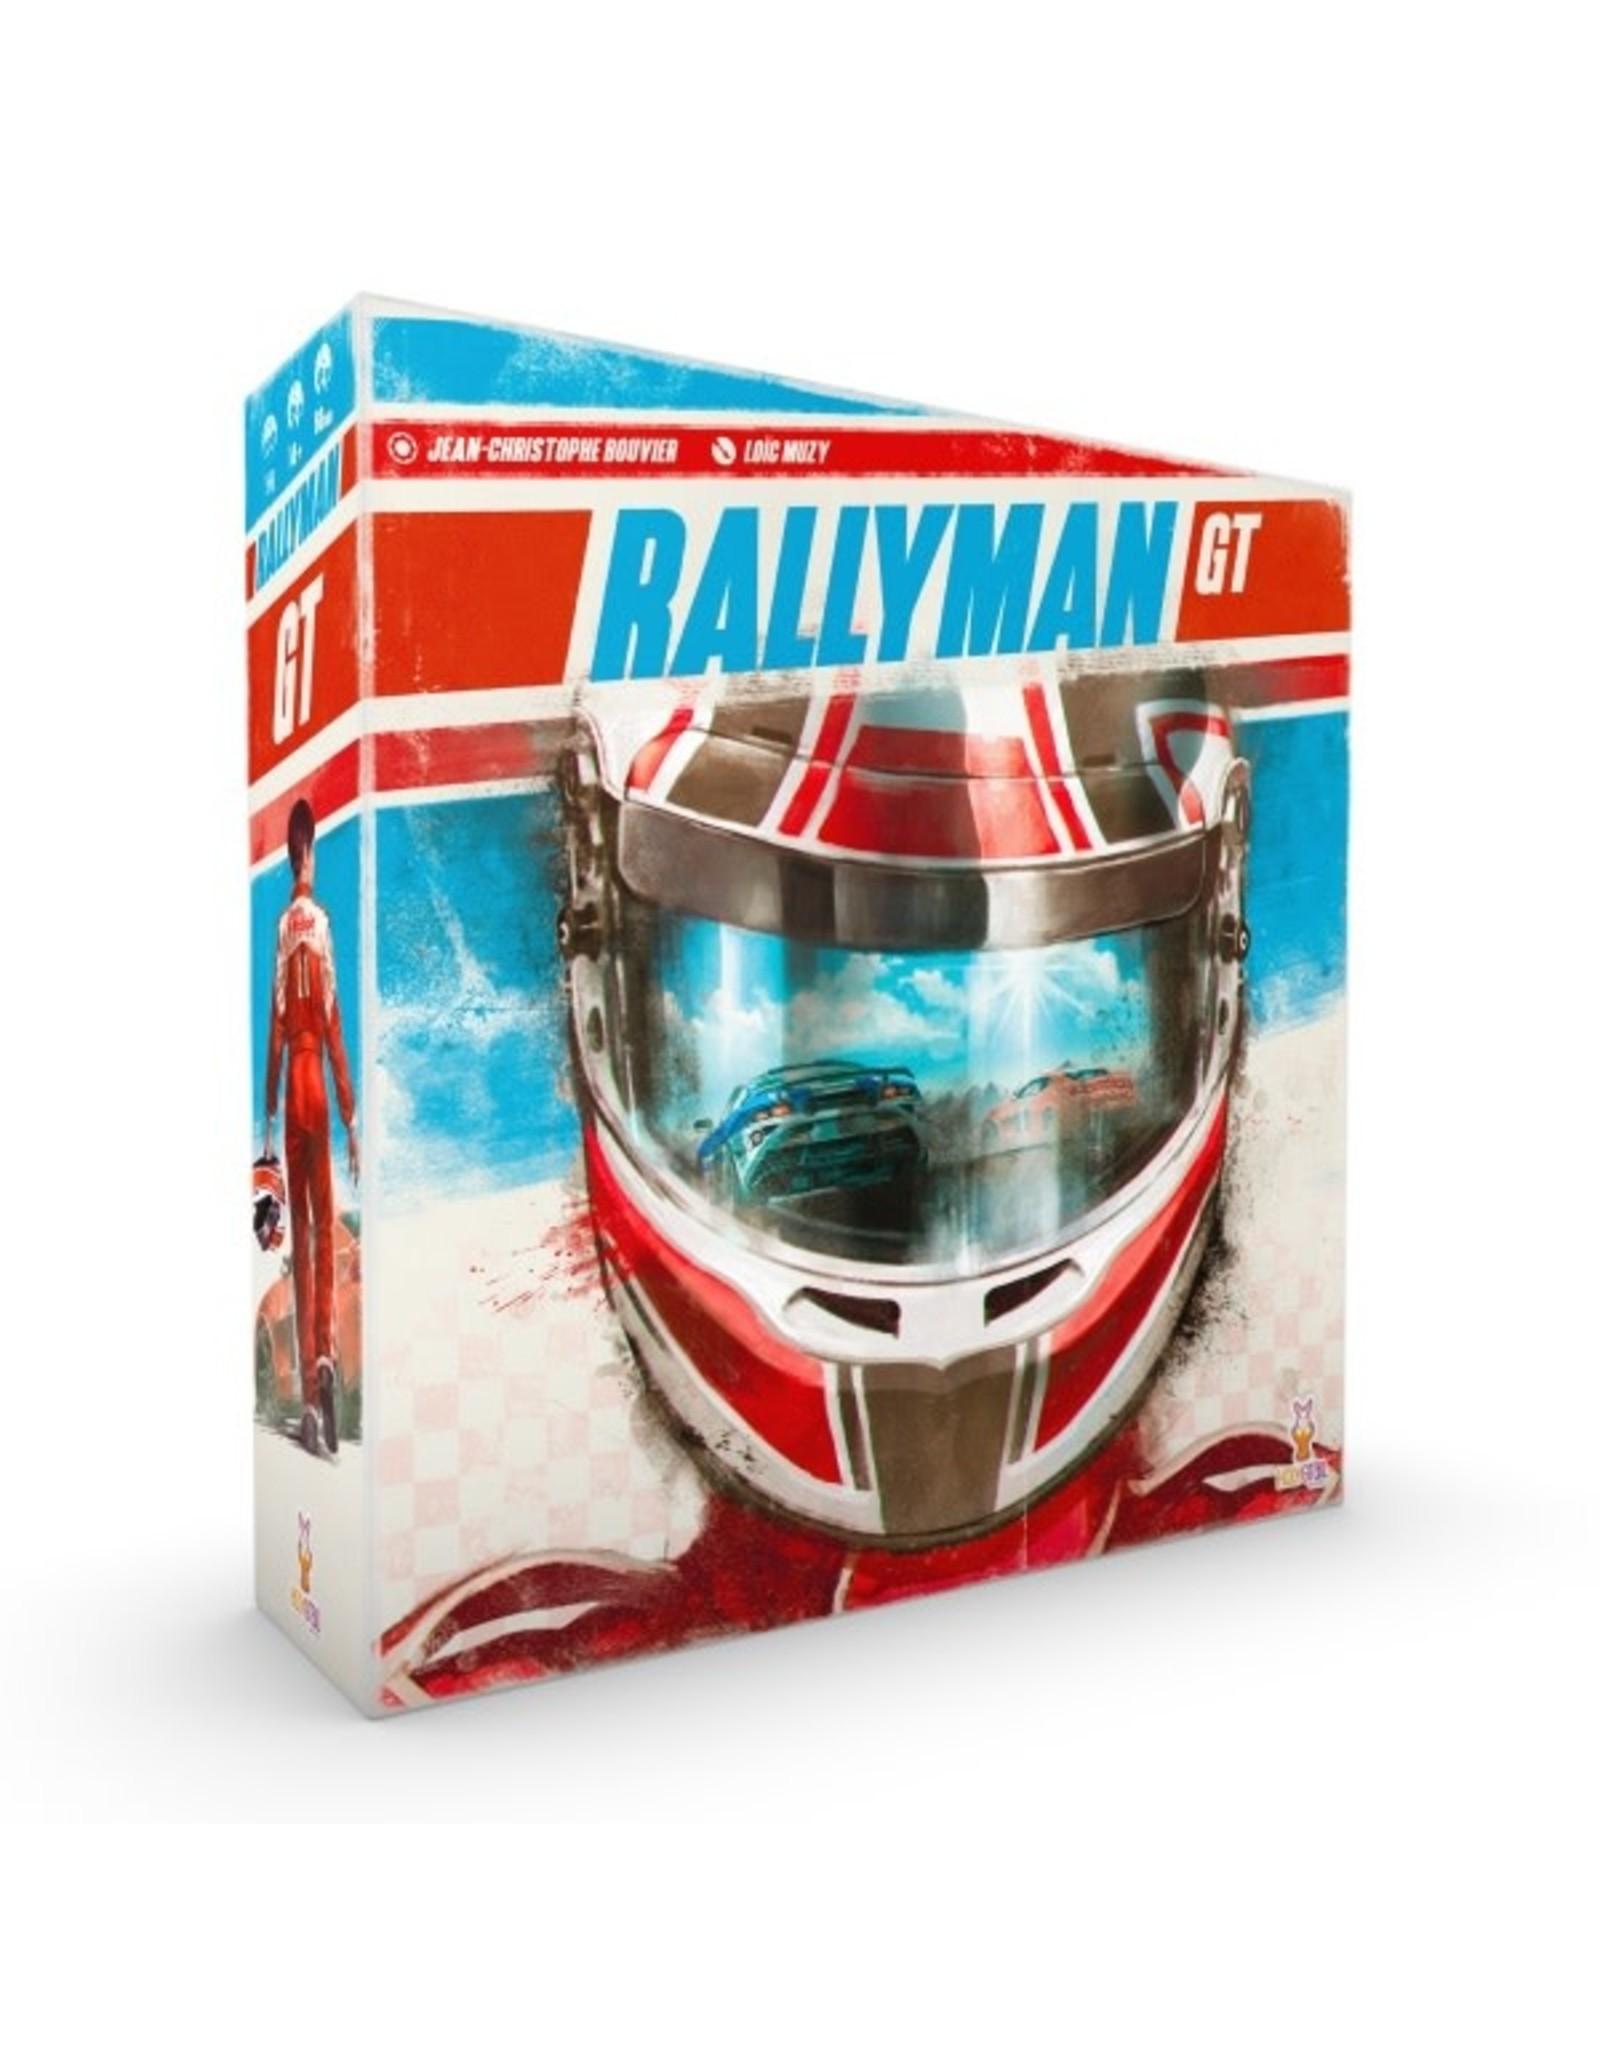 Holy Grail Games Rallyman GT